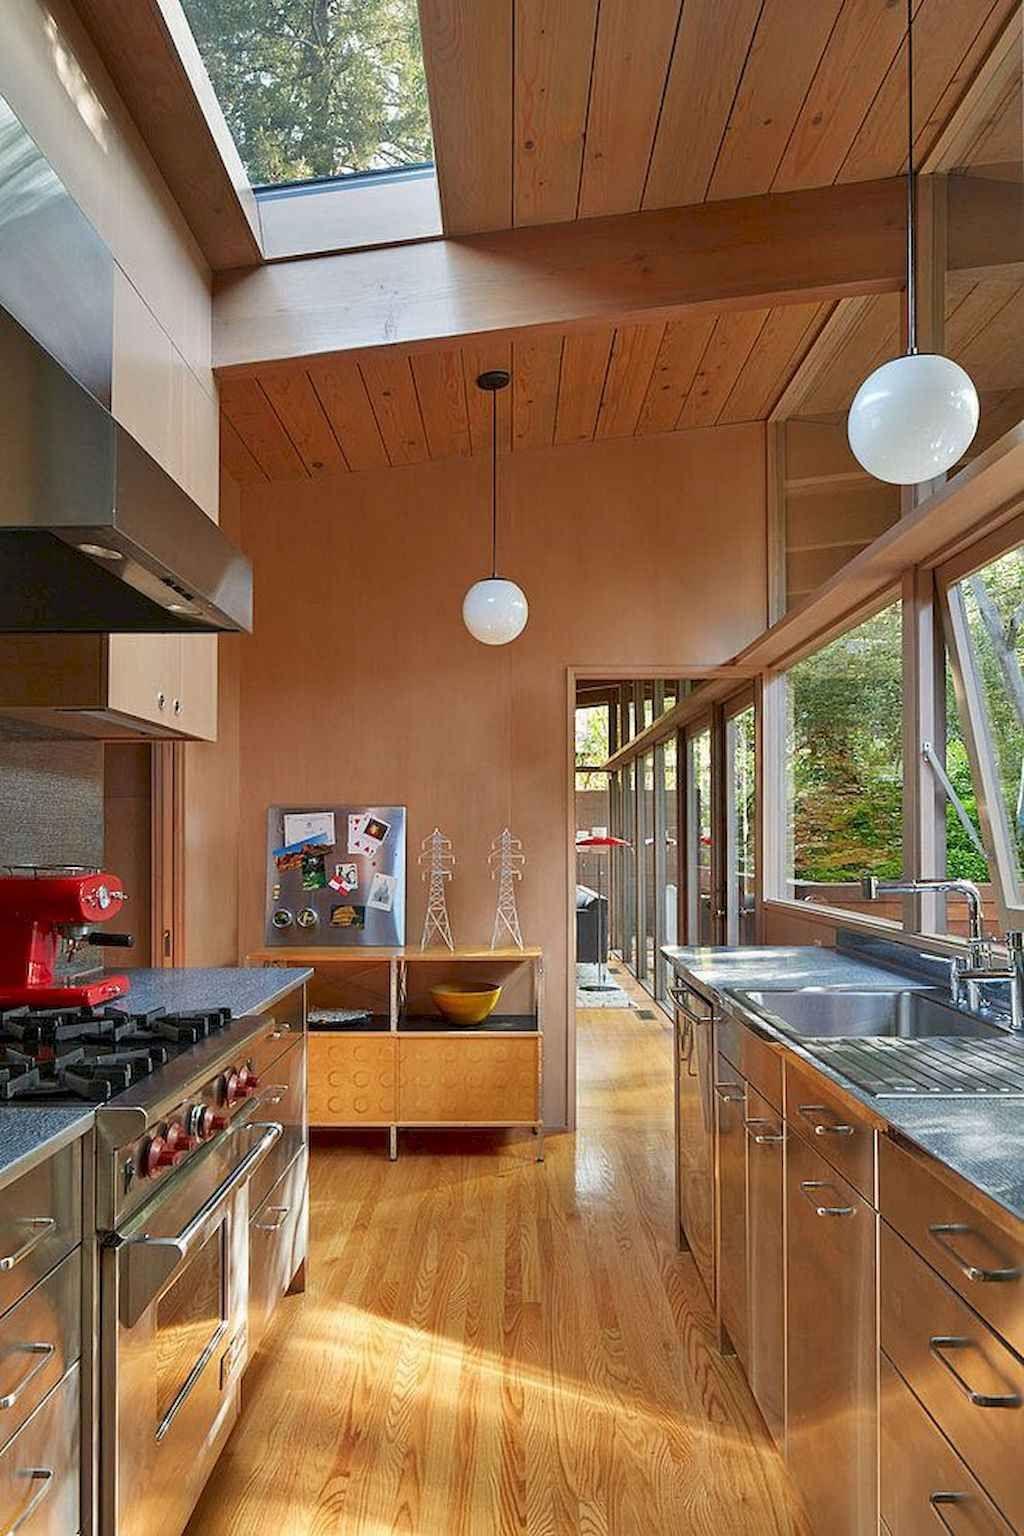 80 modern mid century kitchen remodel ideas spaciroom com mid century modern kitchen design on kitchen ideas modern id=38139